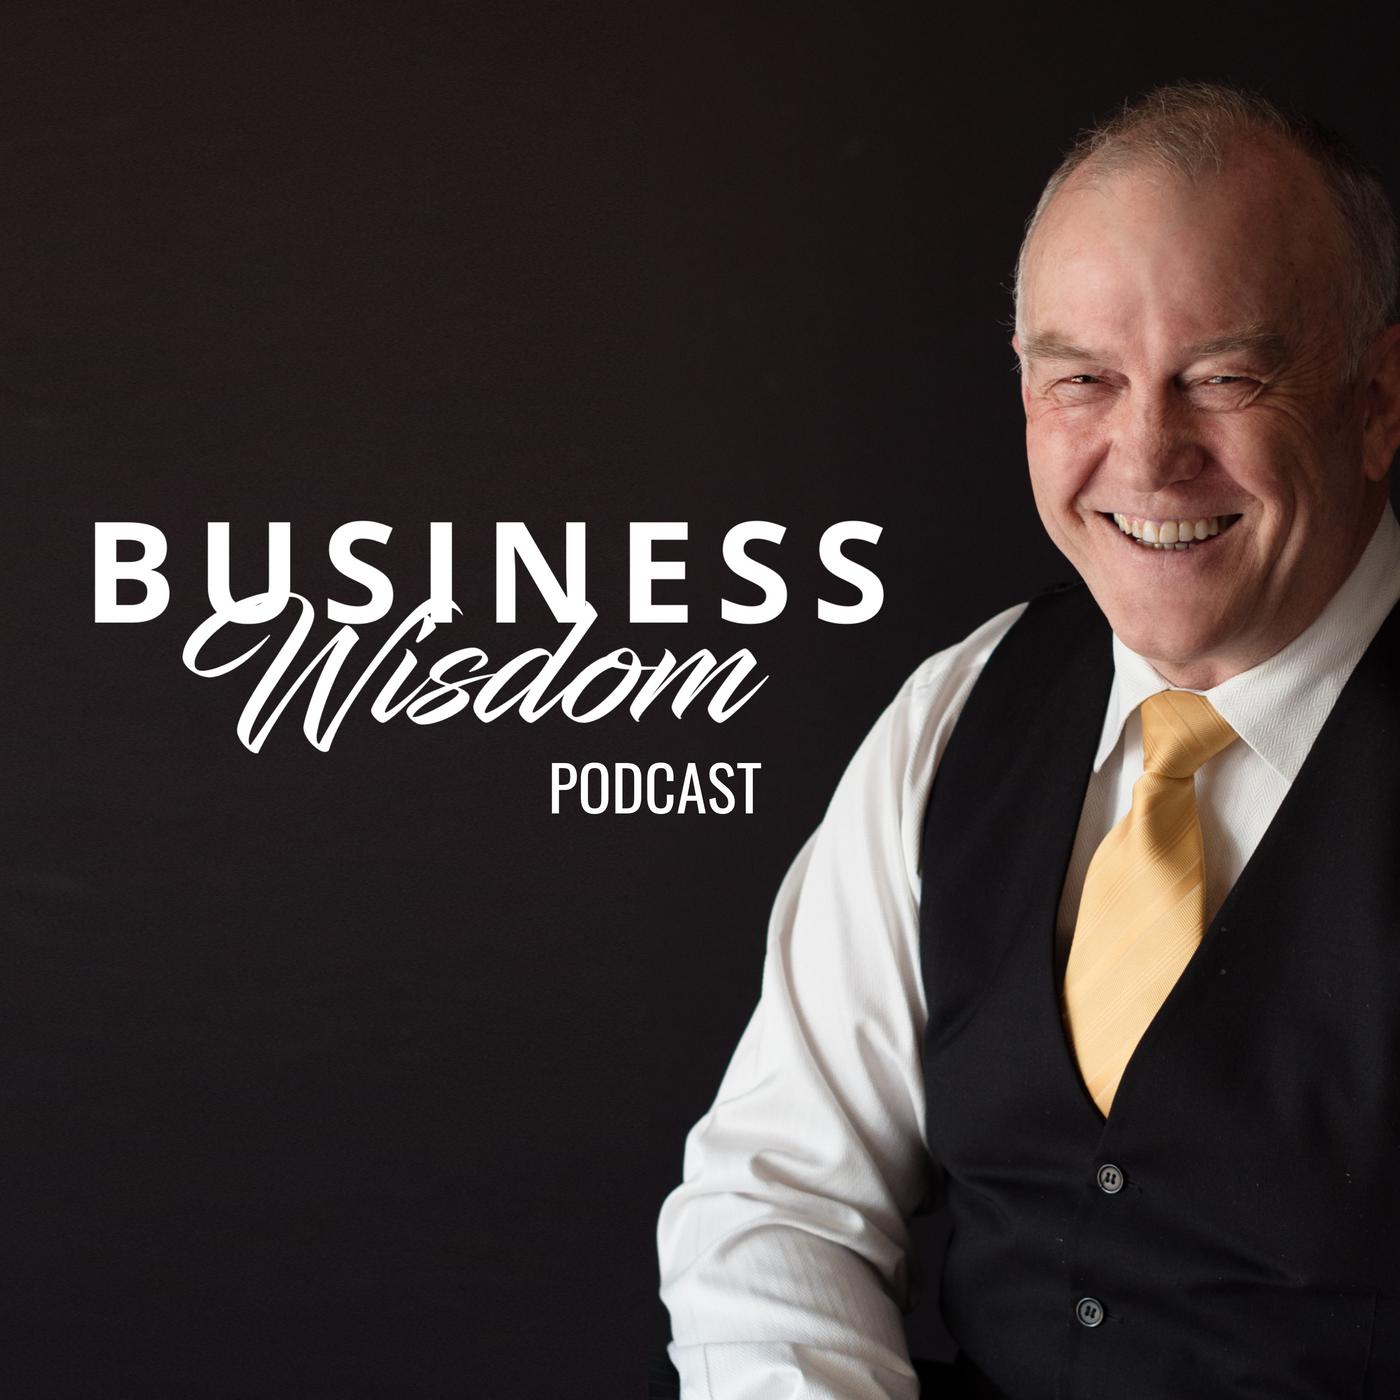 Business Wisdom Podcast